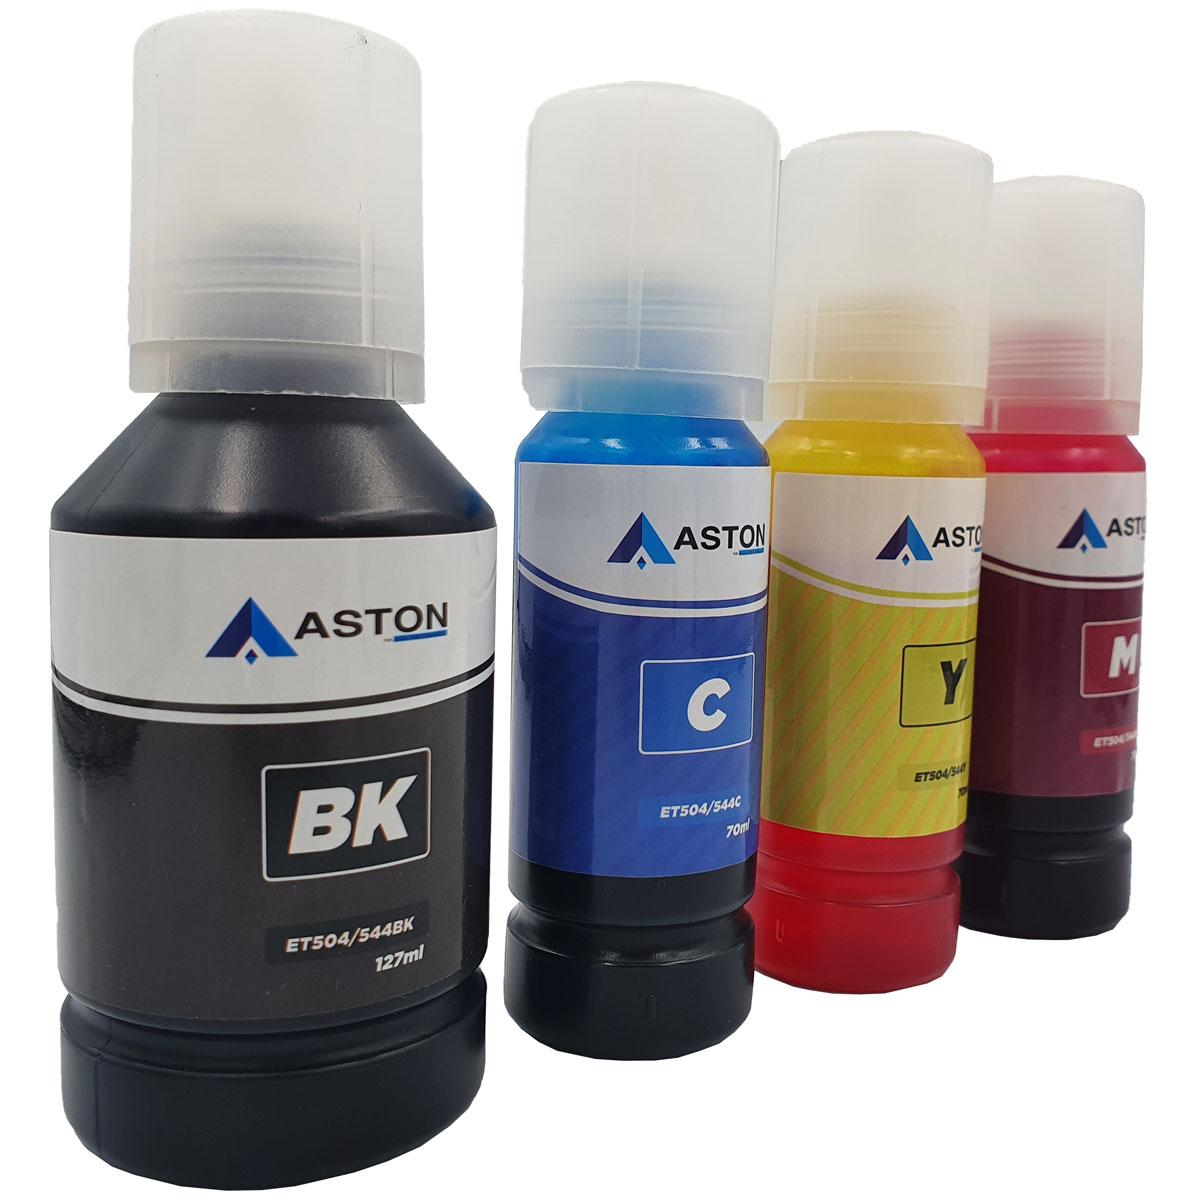 Kit Refil de Tinta T504 T544 Compatível